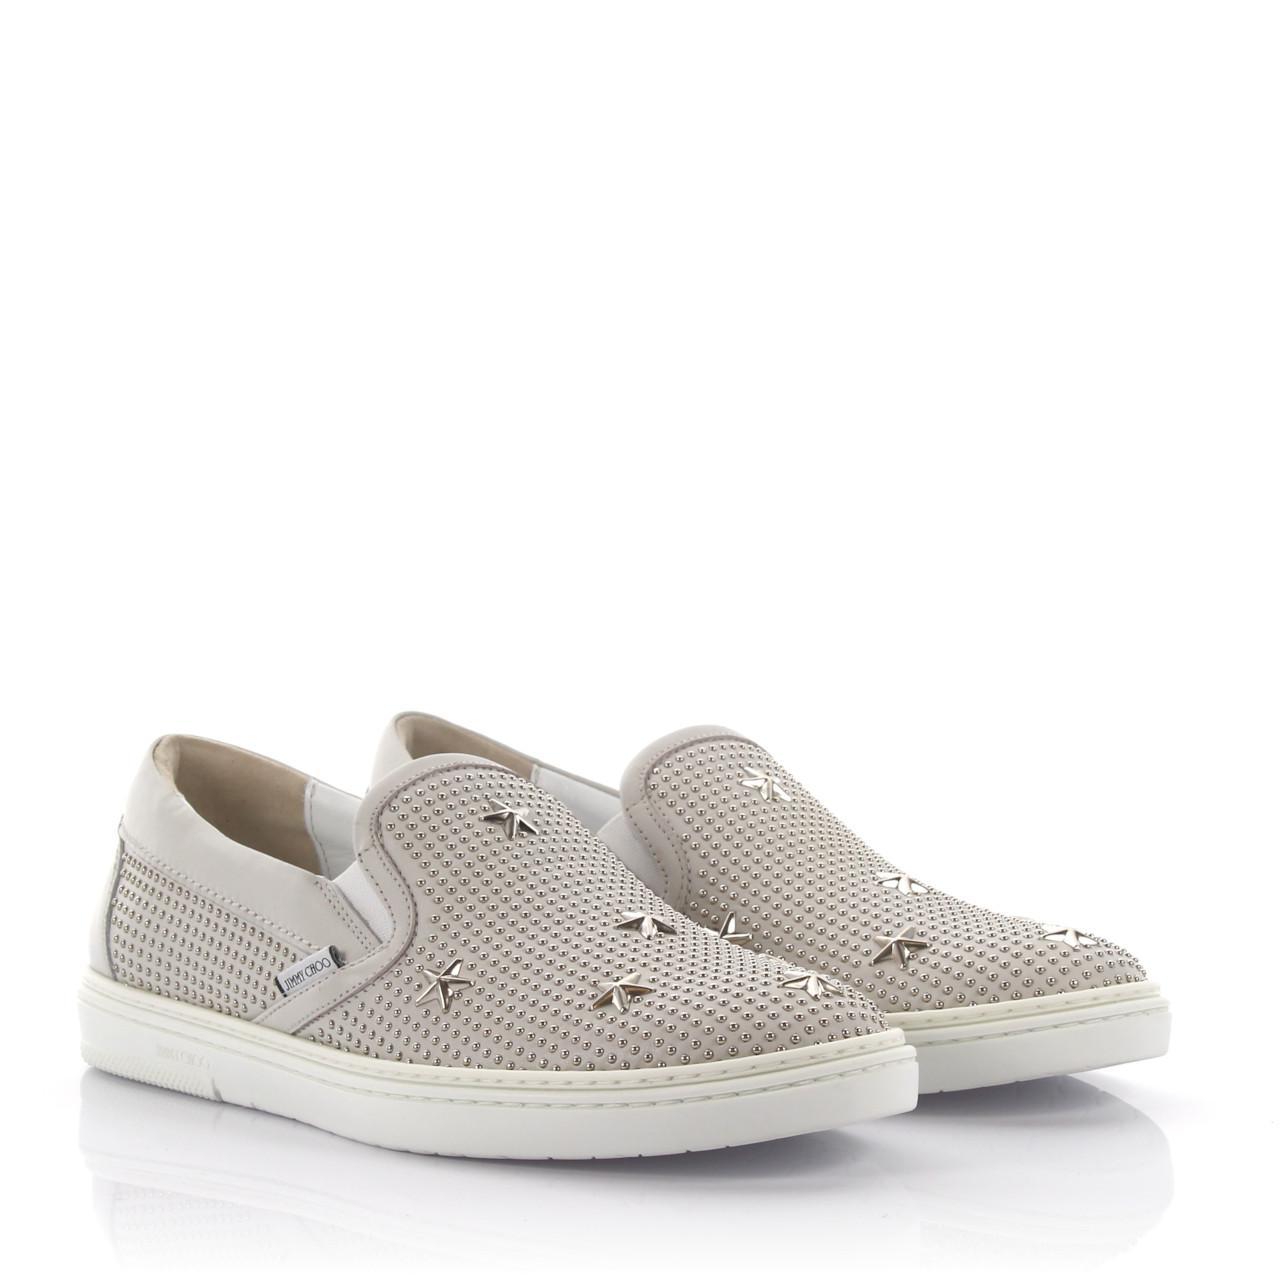 Jimmy chooSneakers slip on Grove leather studs stars silver iK3b1X